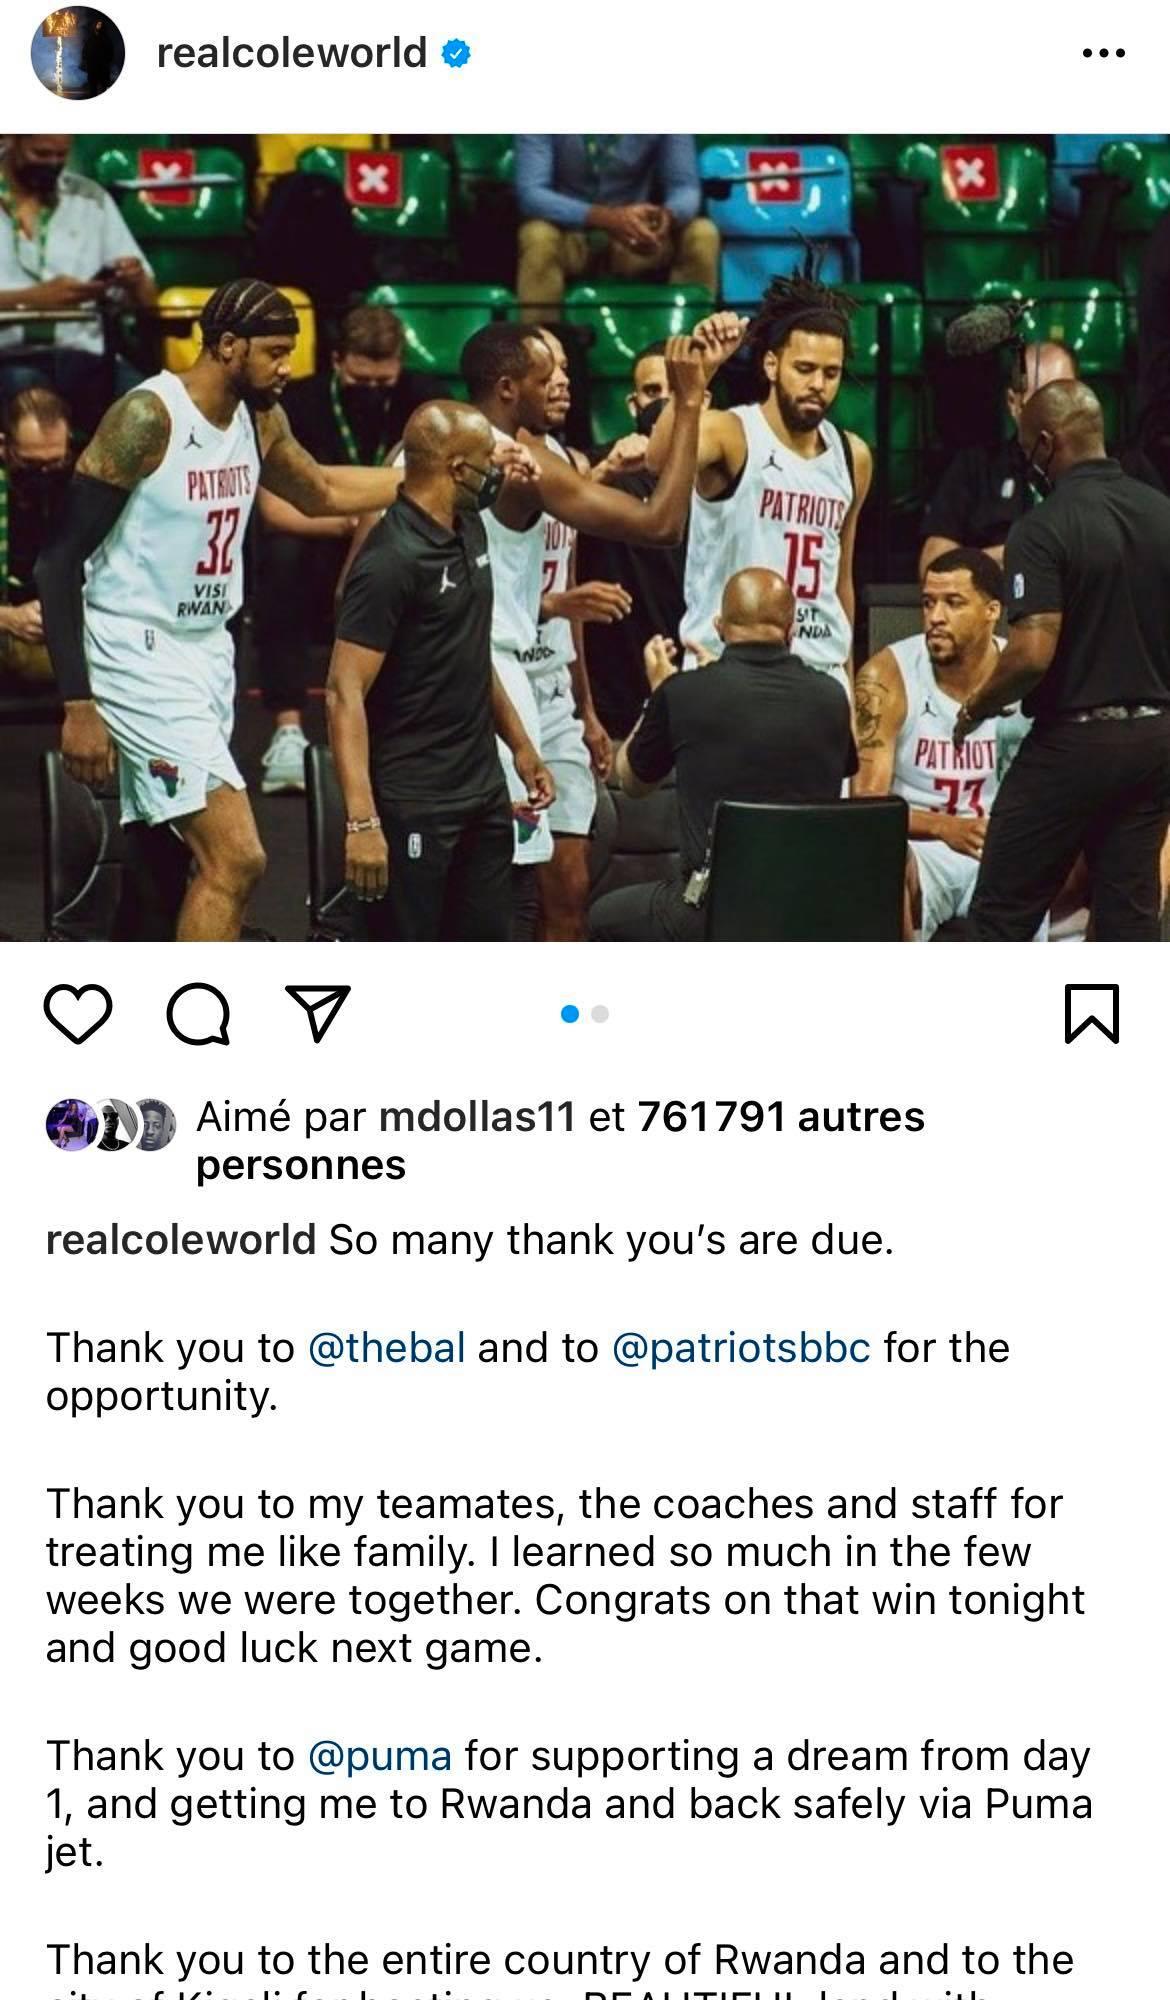 J cole says goodbye to BAL